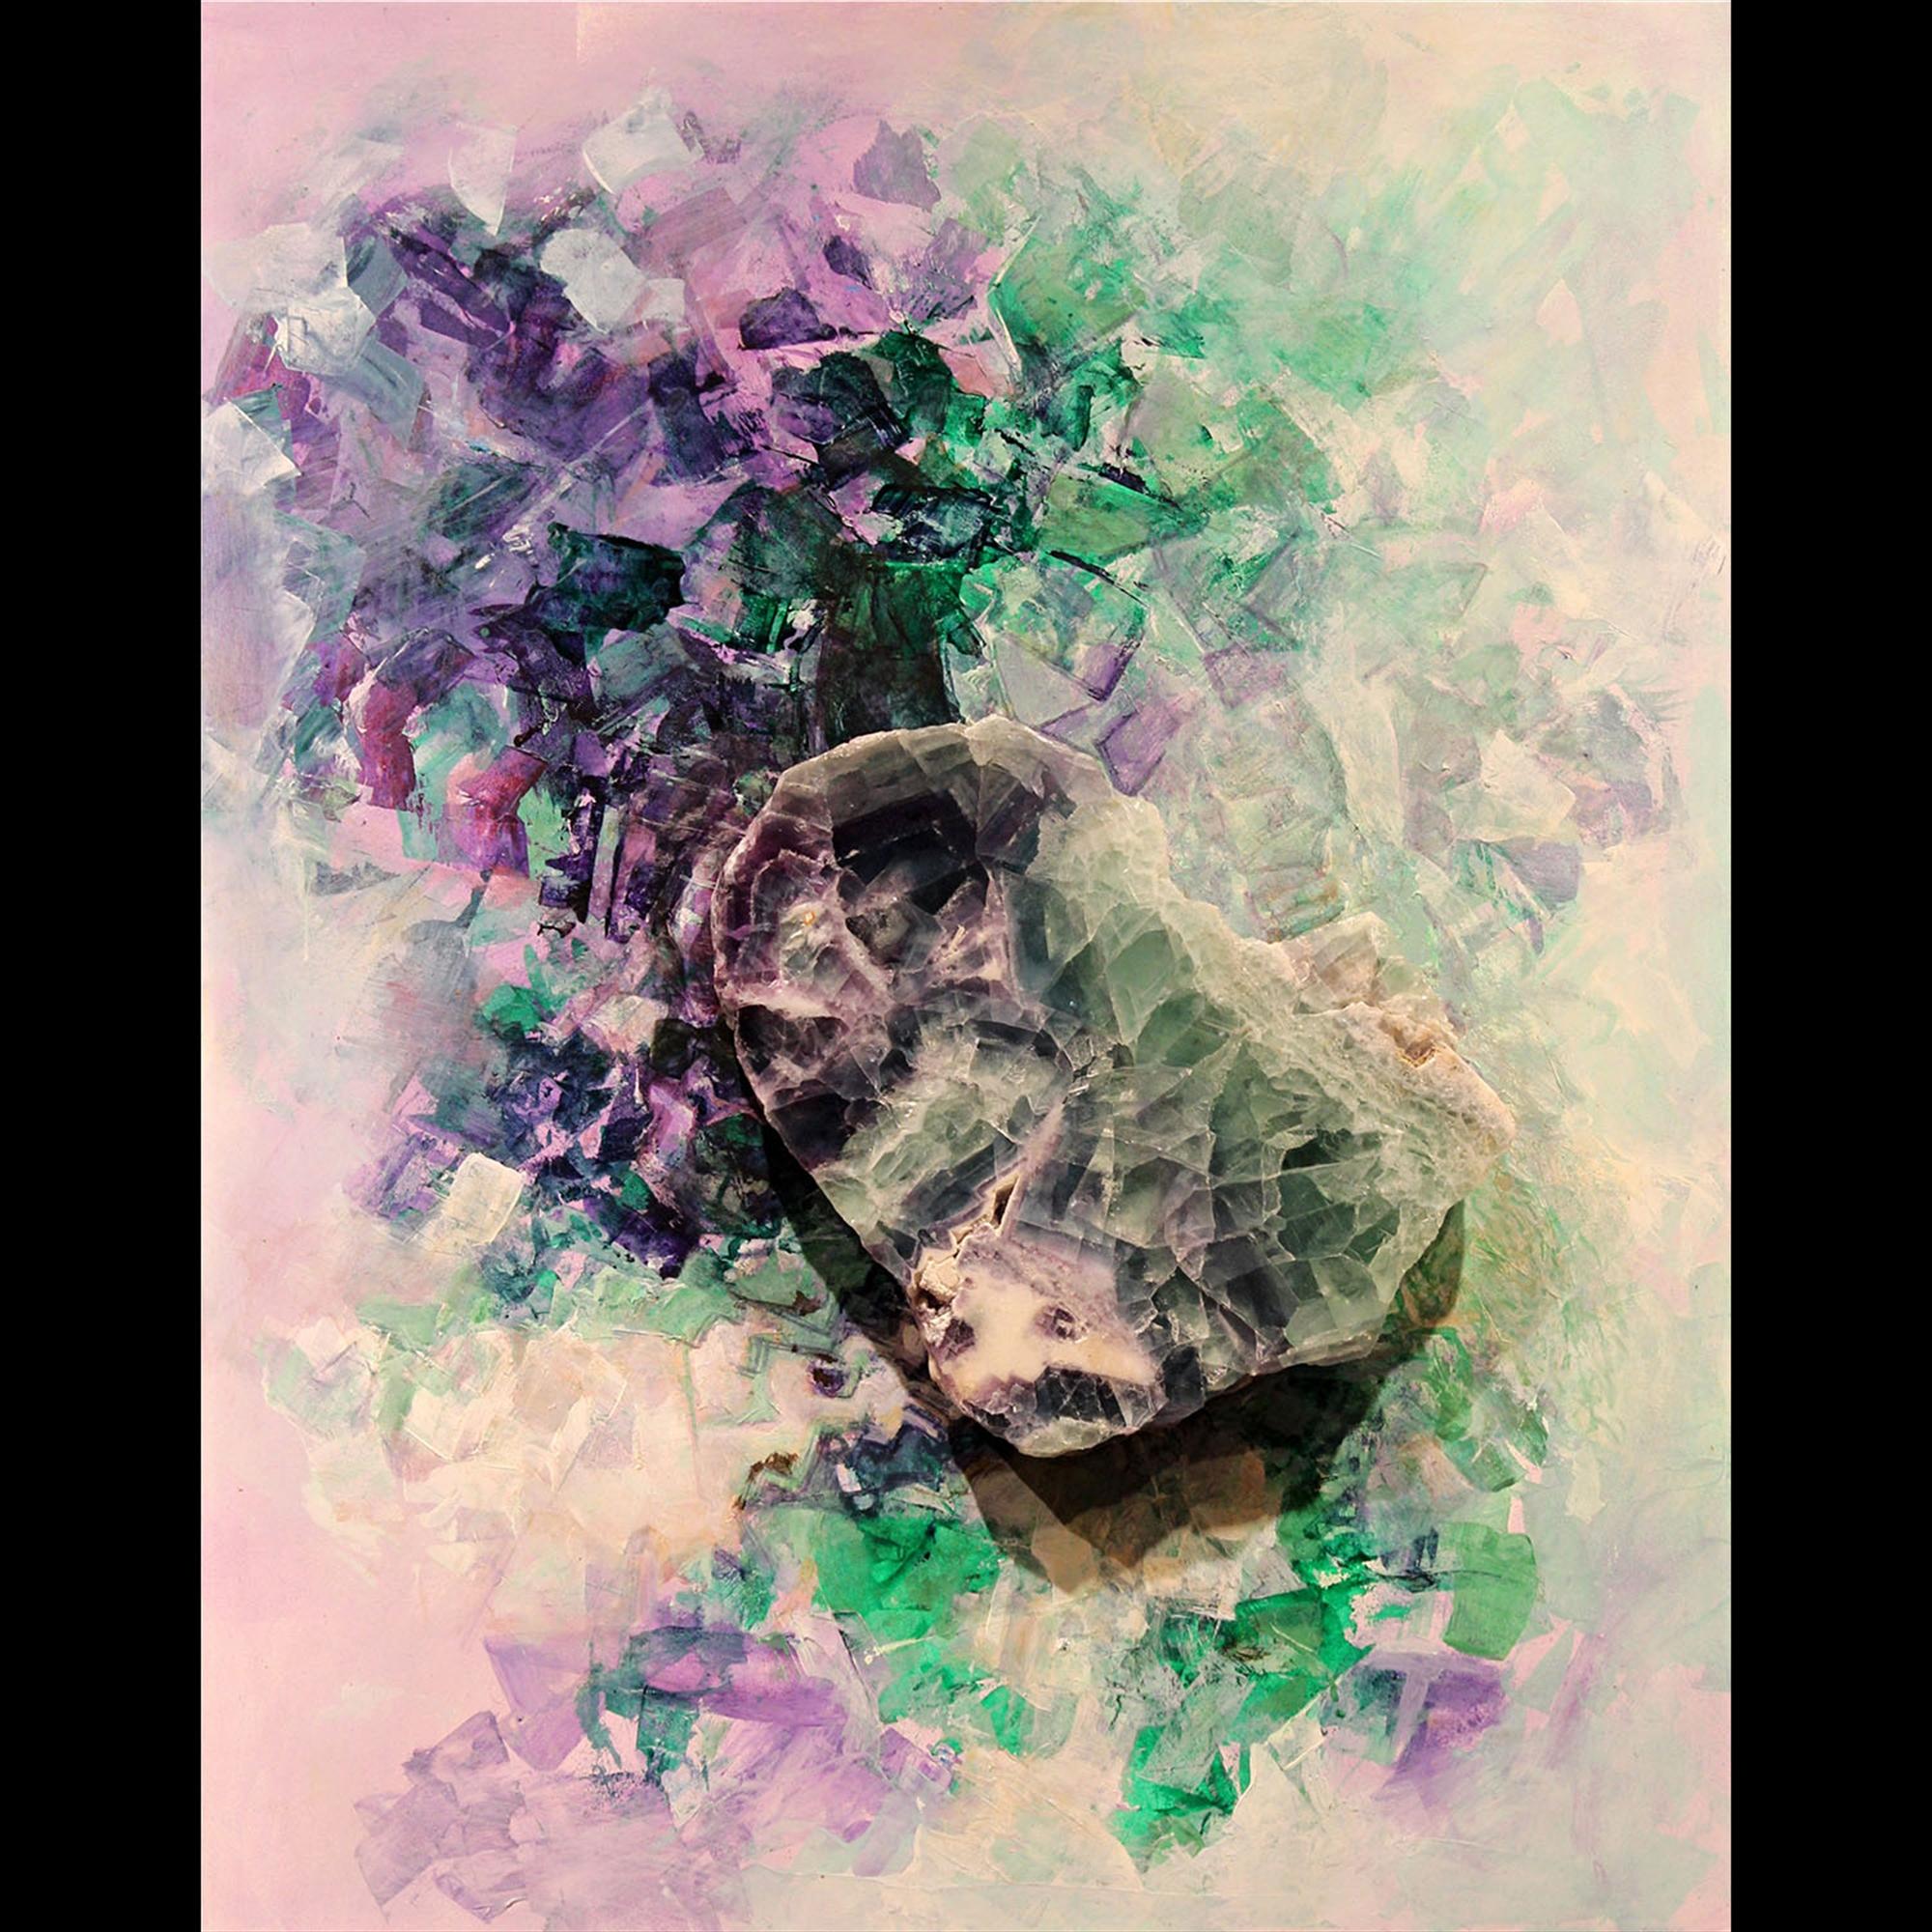 Wild Violets by Marlys Mallét & Michael Redhawk